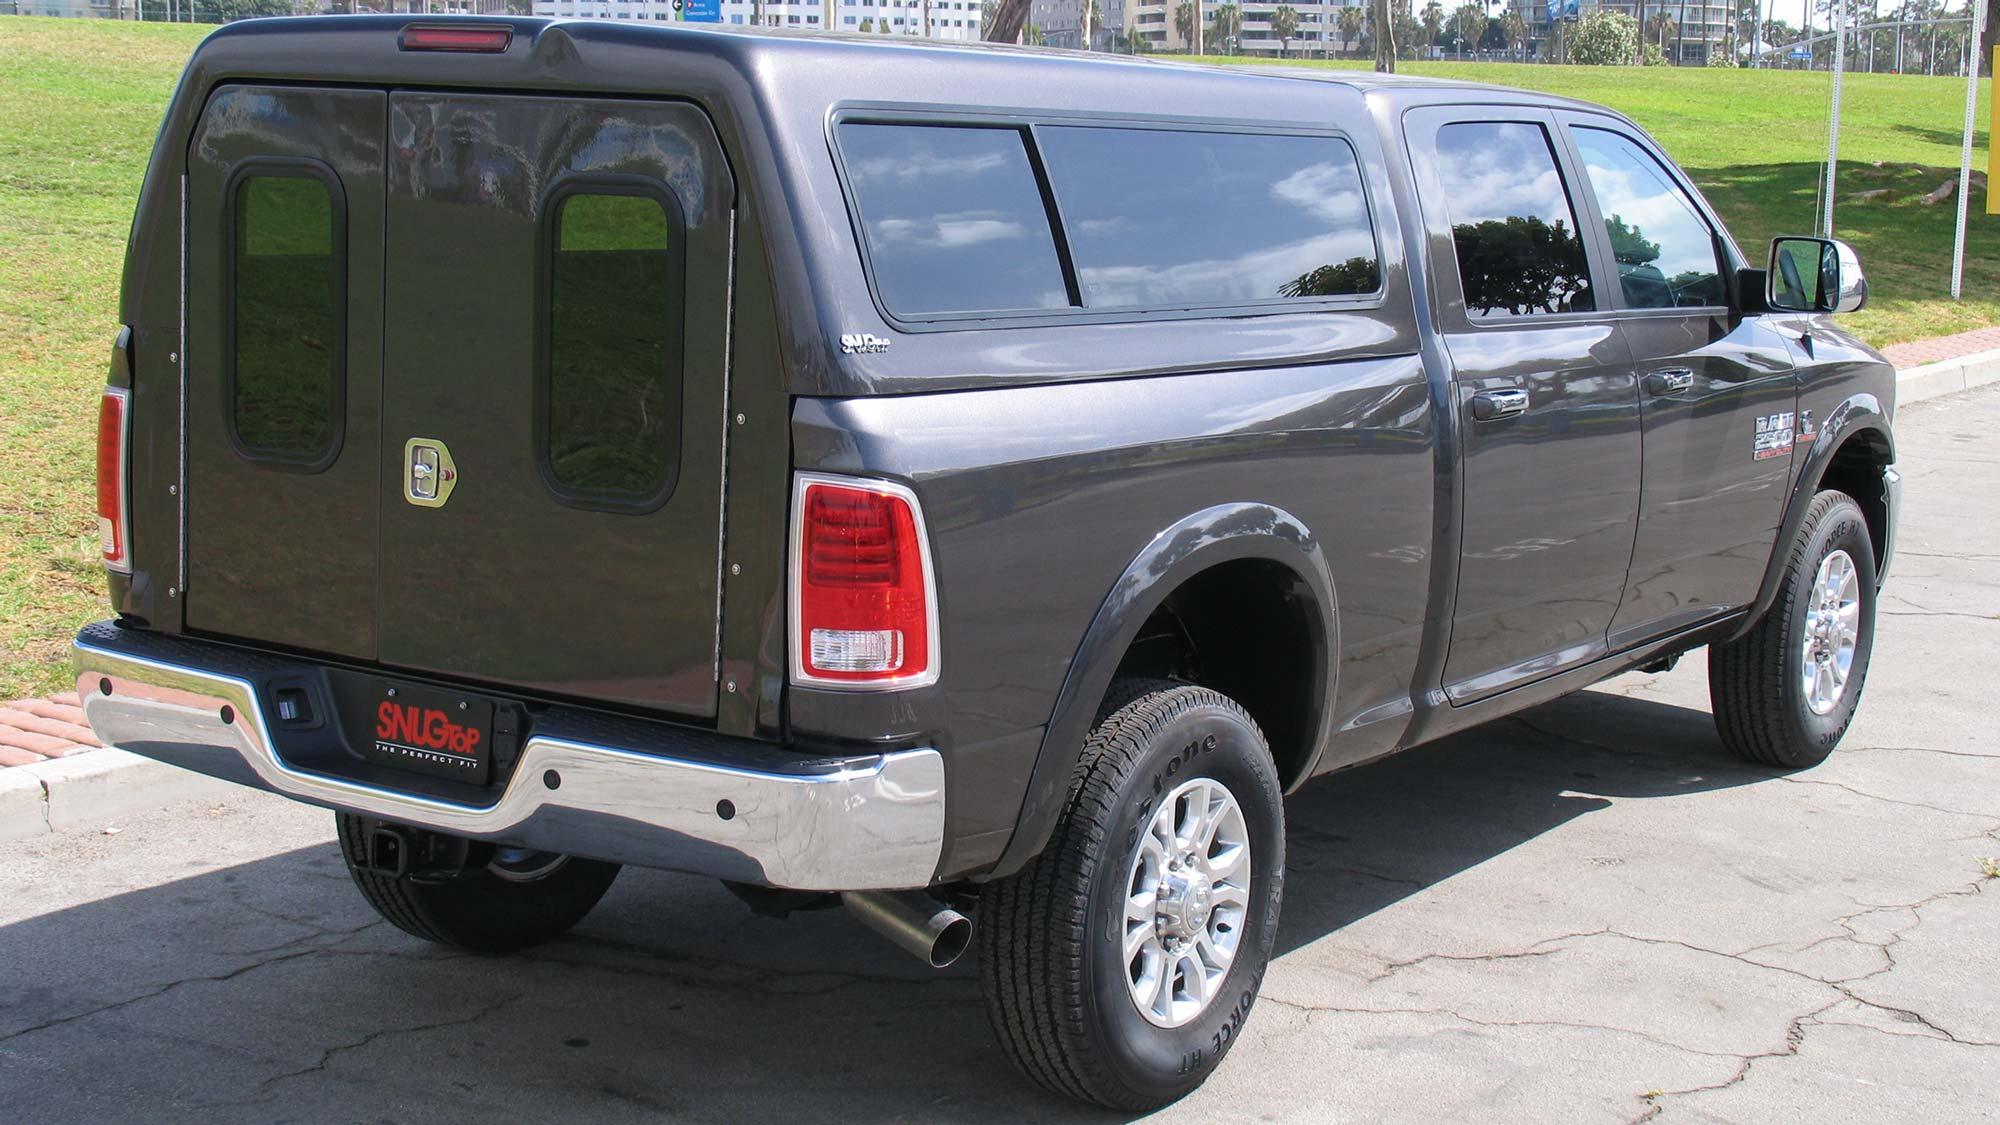 Dark pickup with snugtop